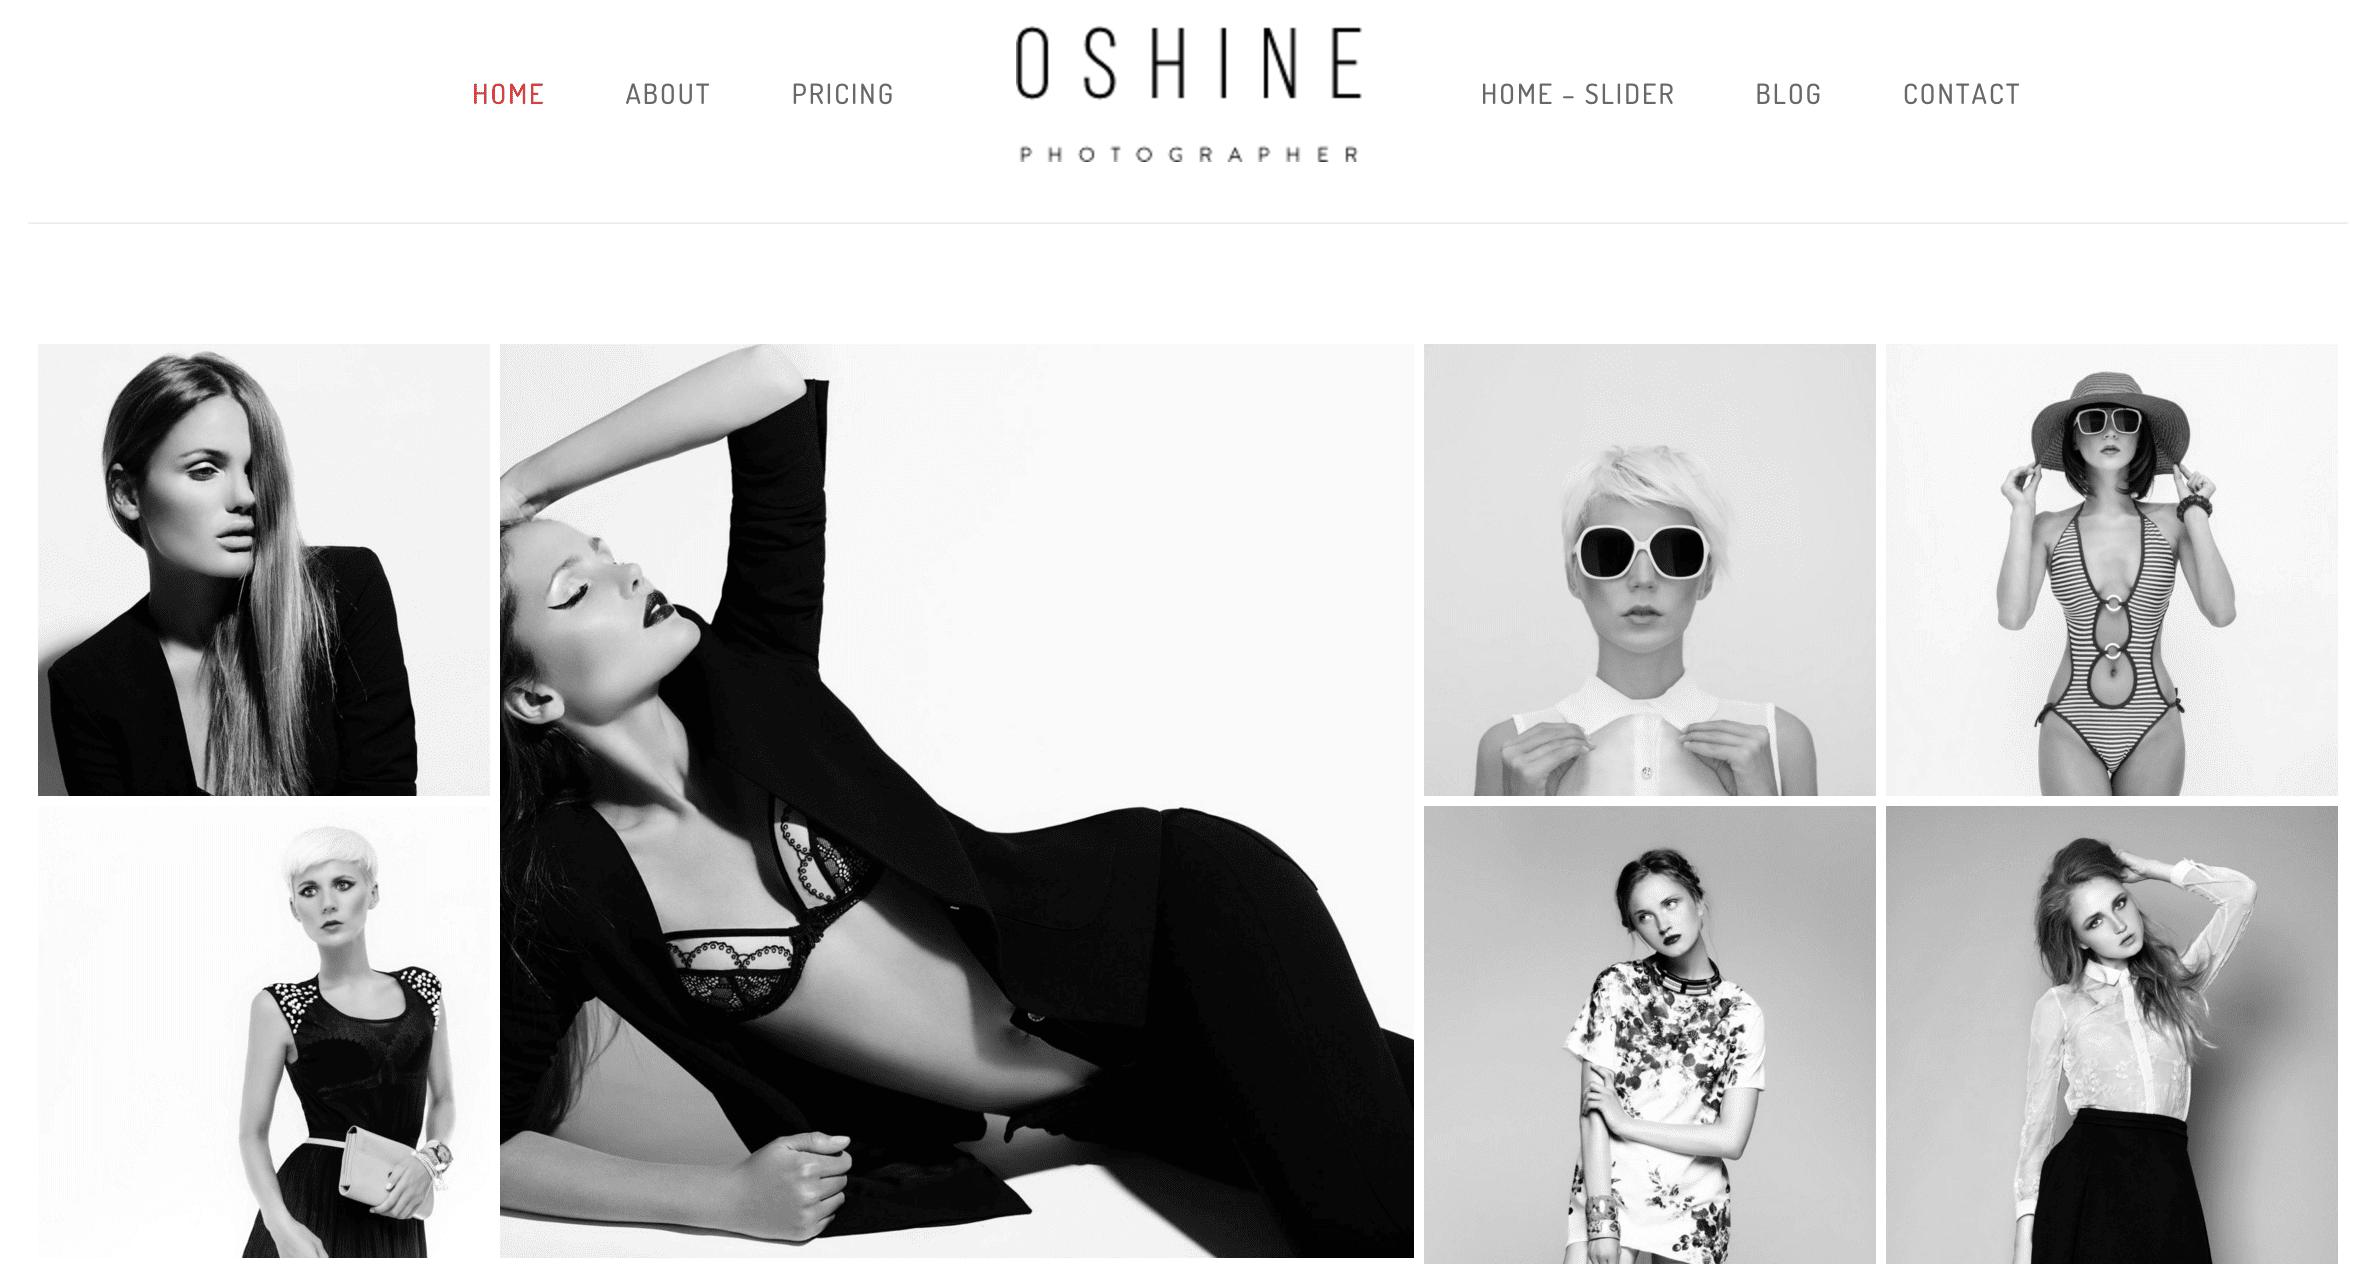 A screenshot of the Oshine theme.